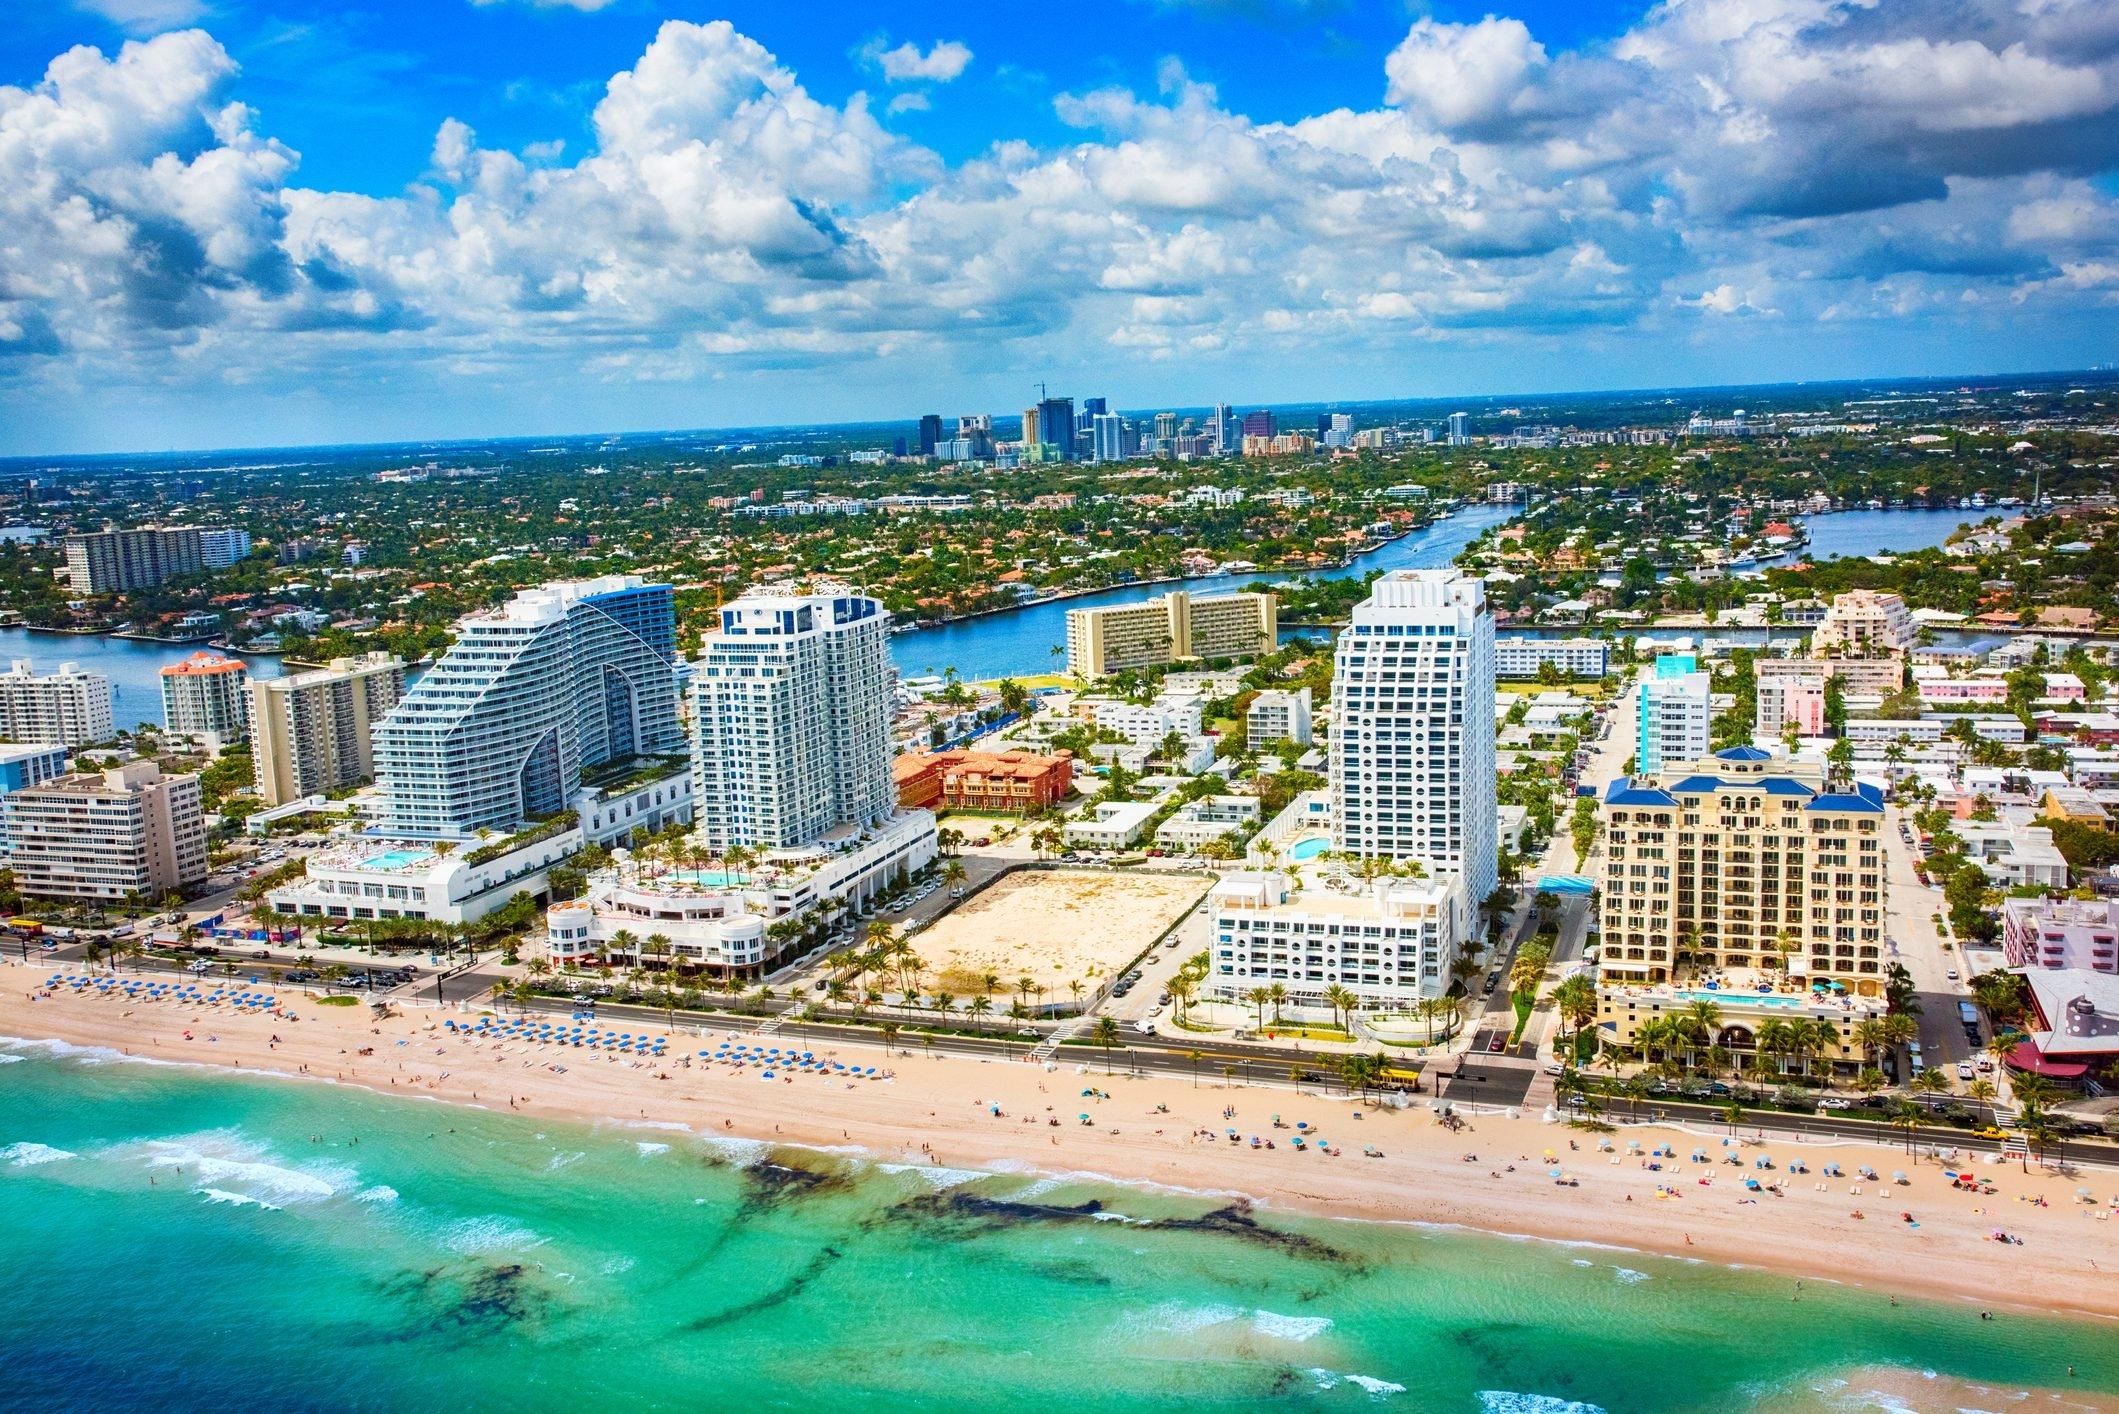 Fort Lauderdale Beachfront Hotels